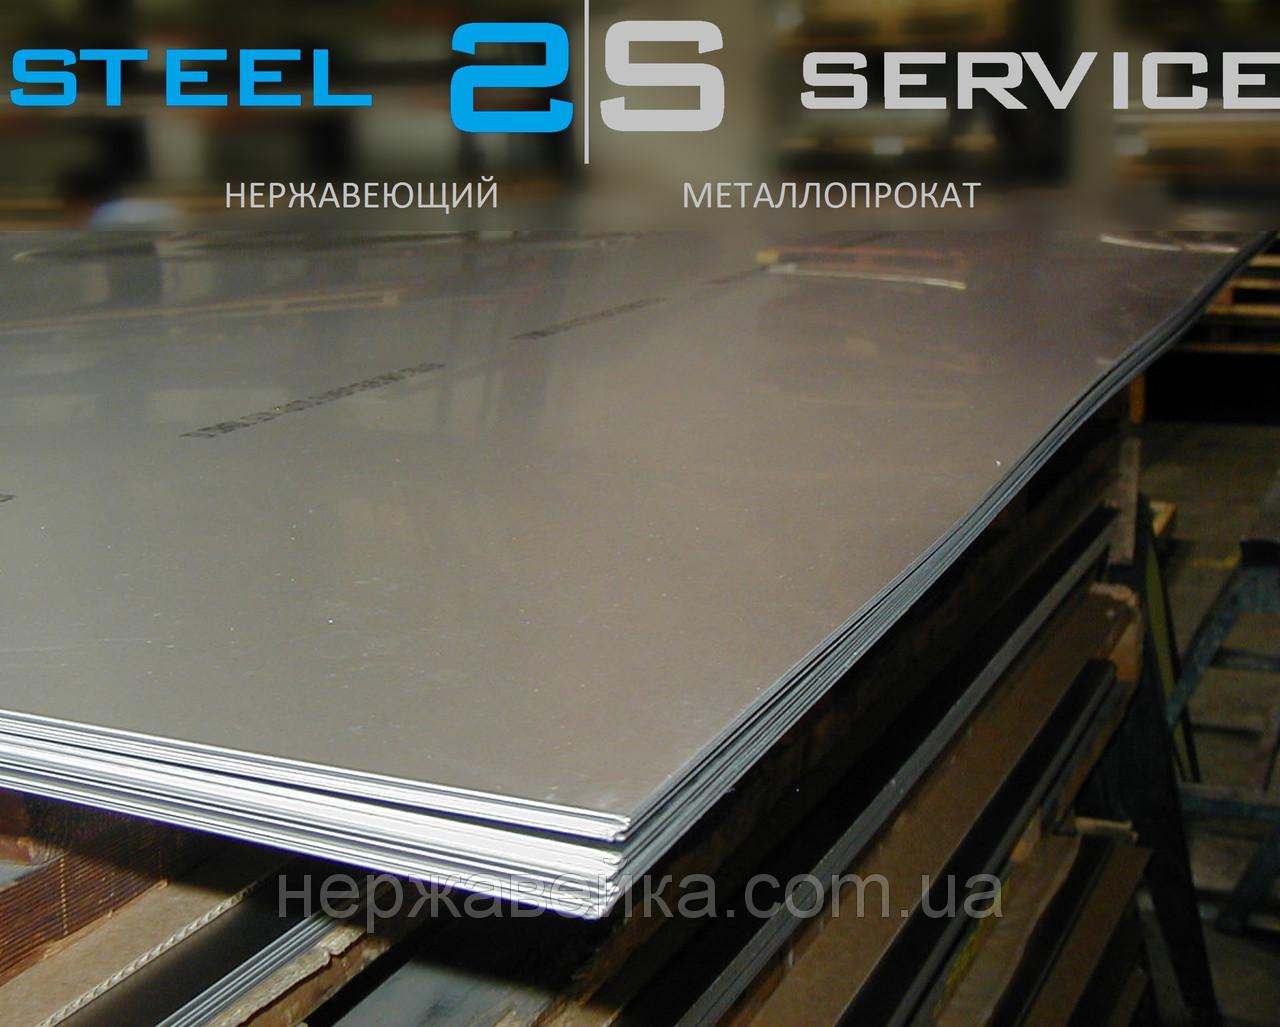 Нержавеющий лист 8х1500х3000мм  AISI 316L(03Х17Н14М3) F1 - горячекатанный,  кислотостойкий